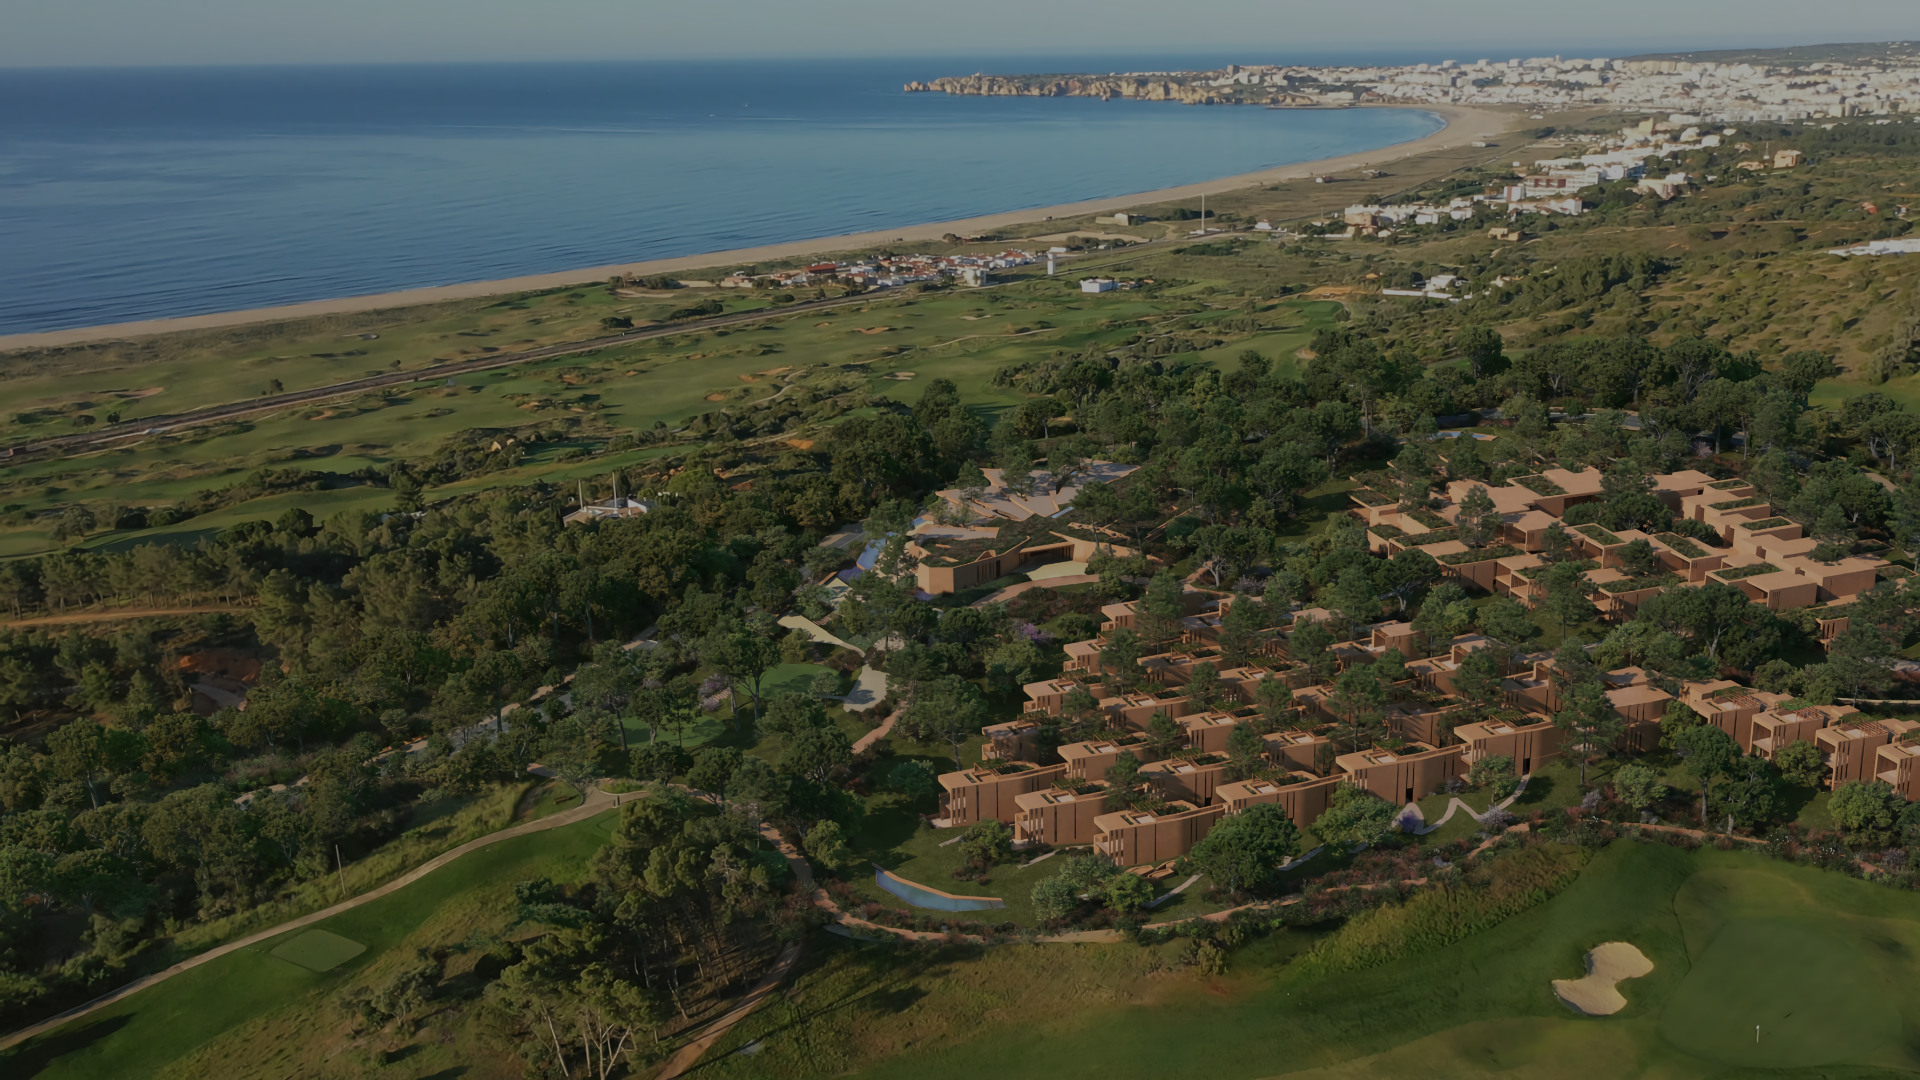 Apartments Palmares